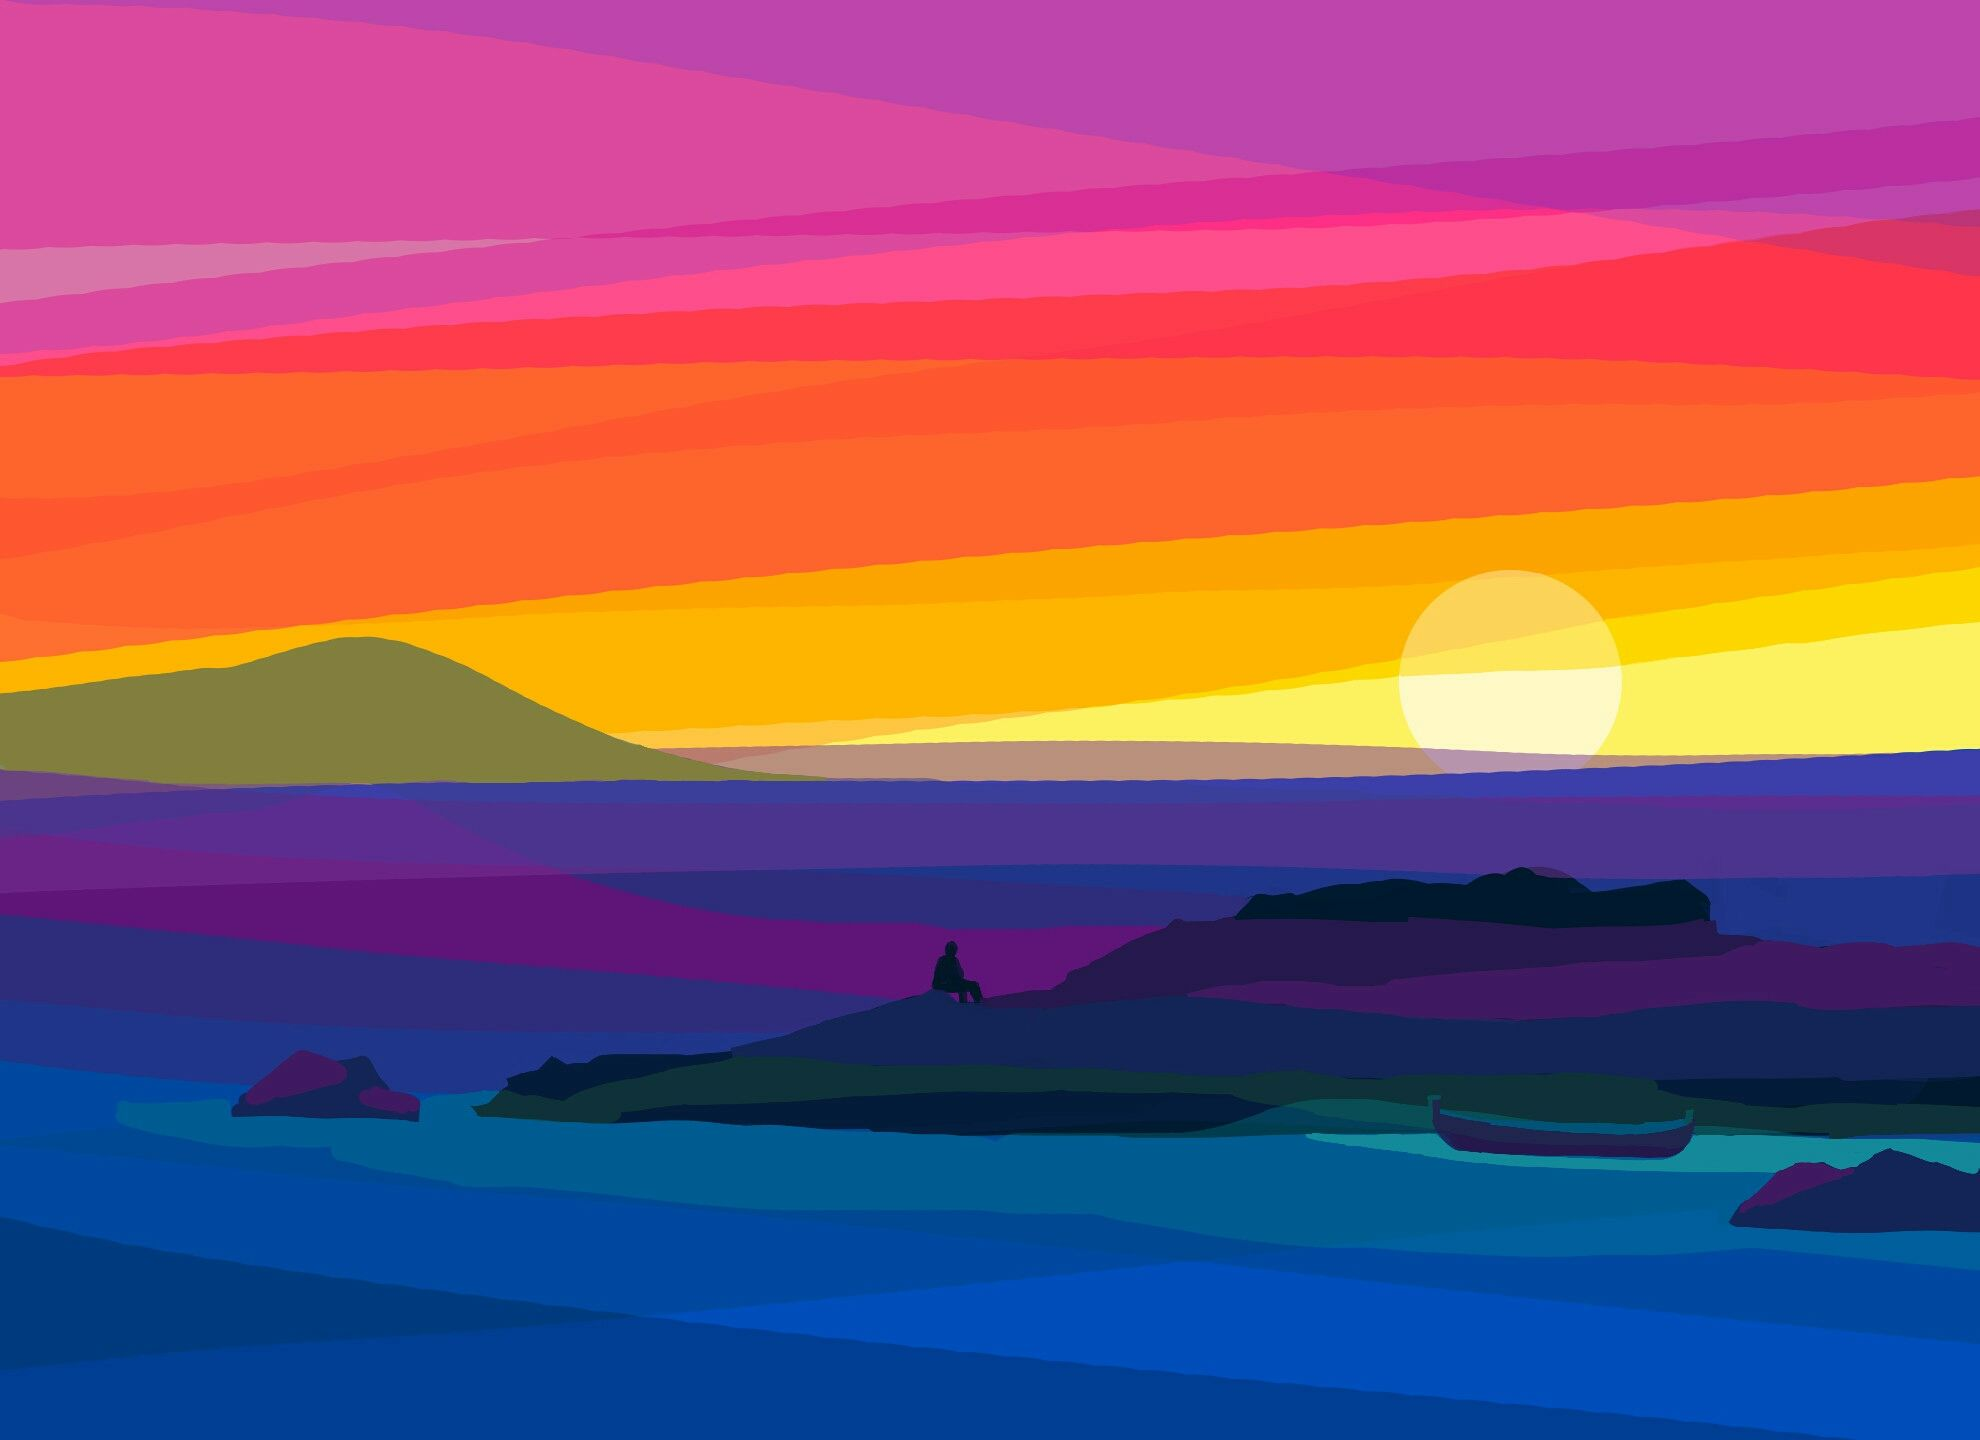 Sunrise Amanecer Pintado Con Picsaypro Android Material Design Aleatoric Blog Archive Circuitbending Tutorial